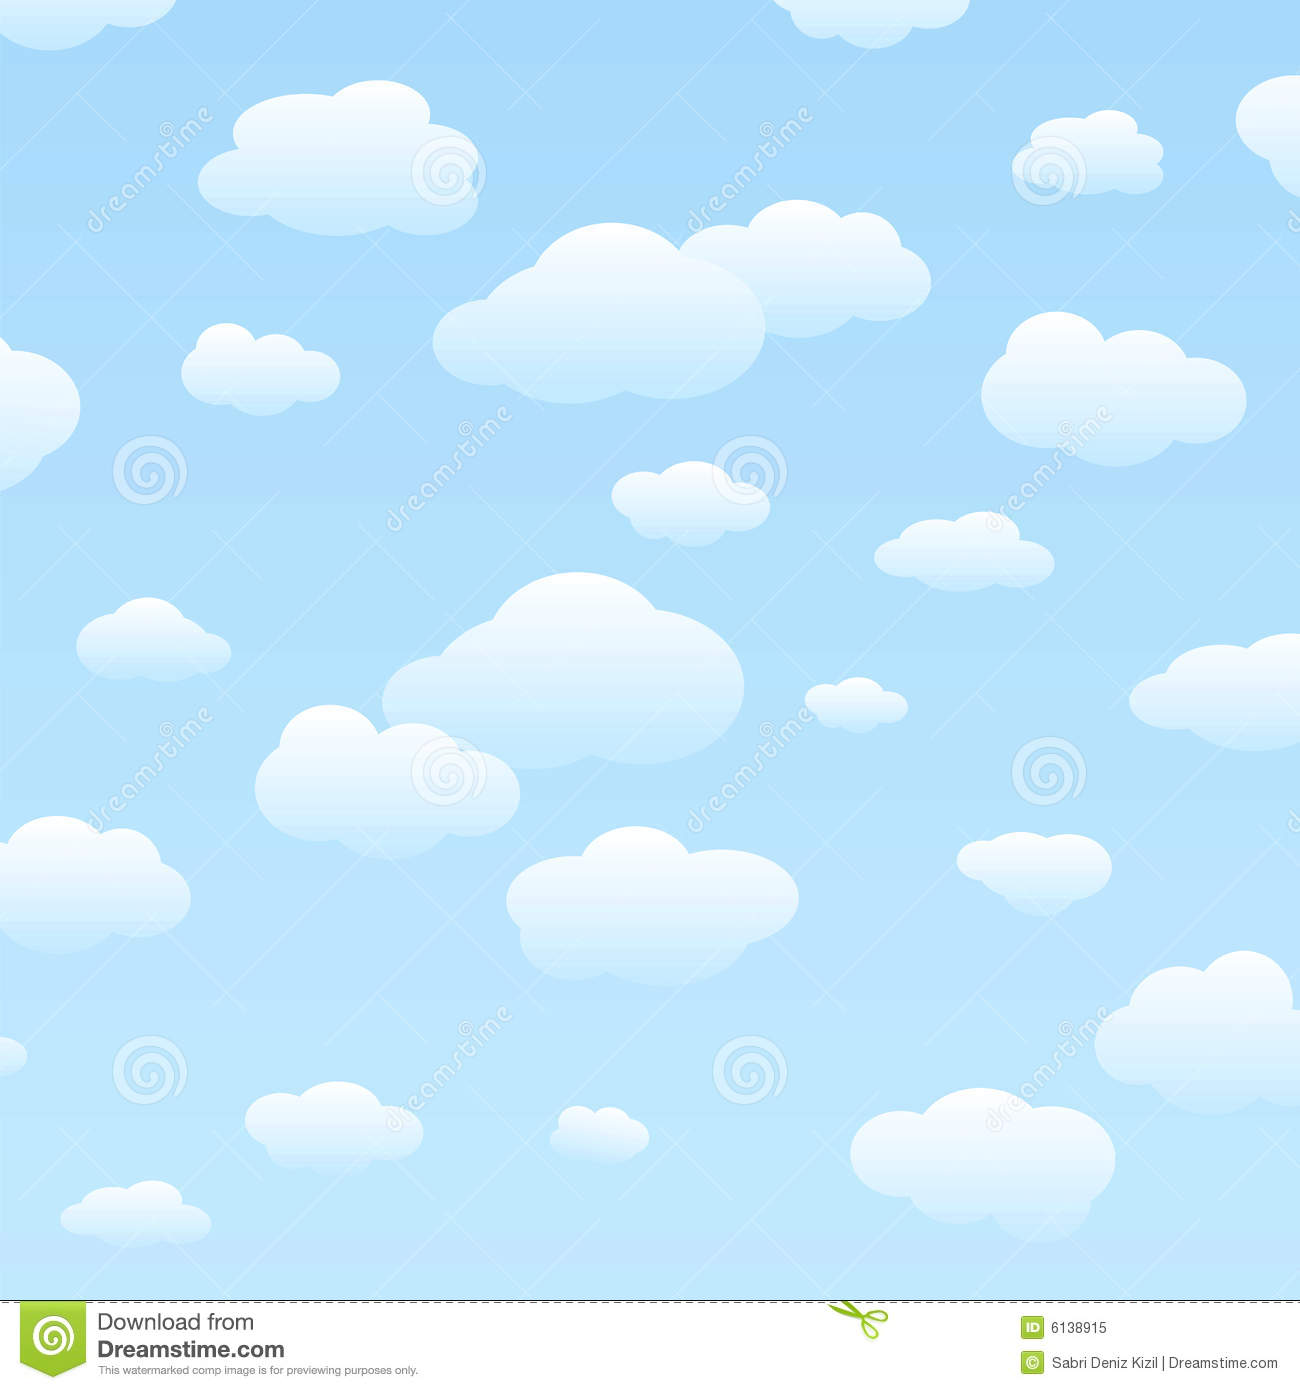 cloud clipart background - photo #41